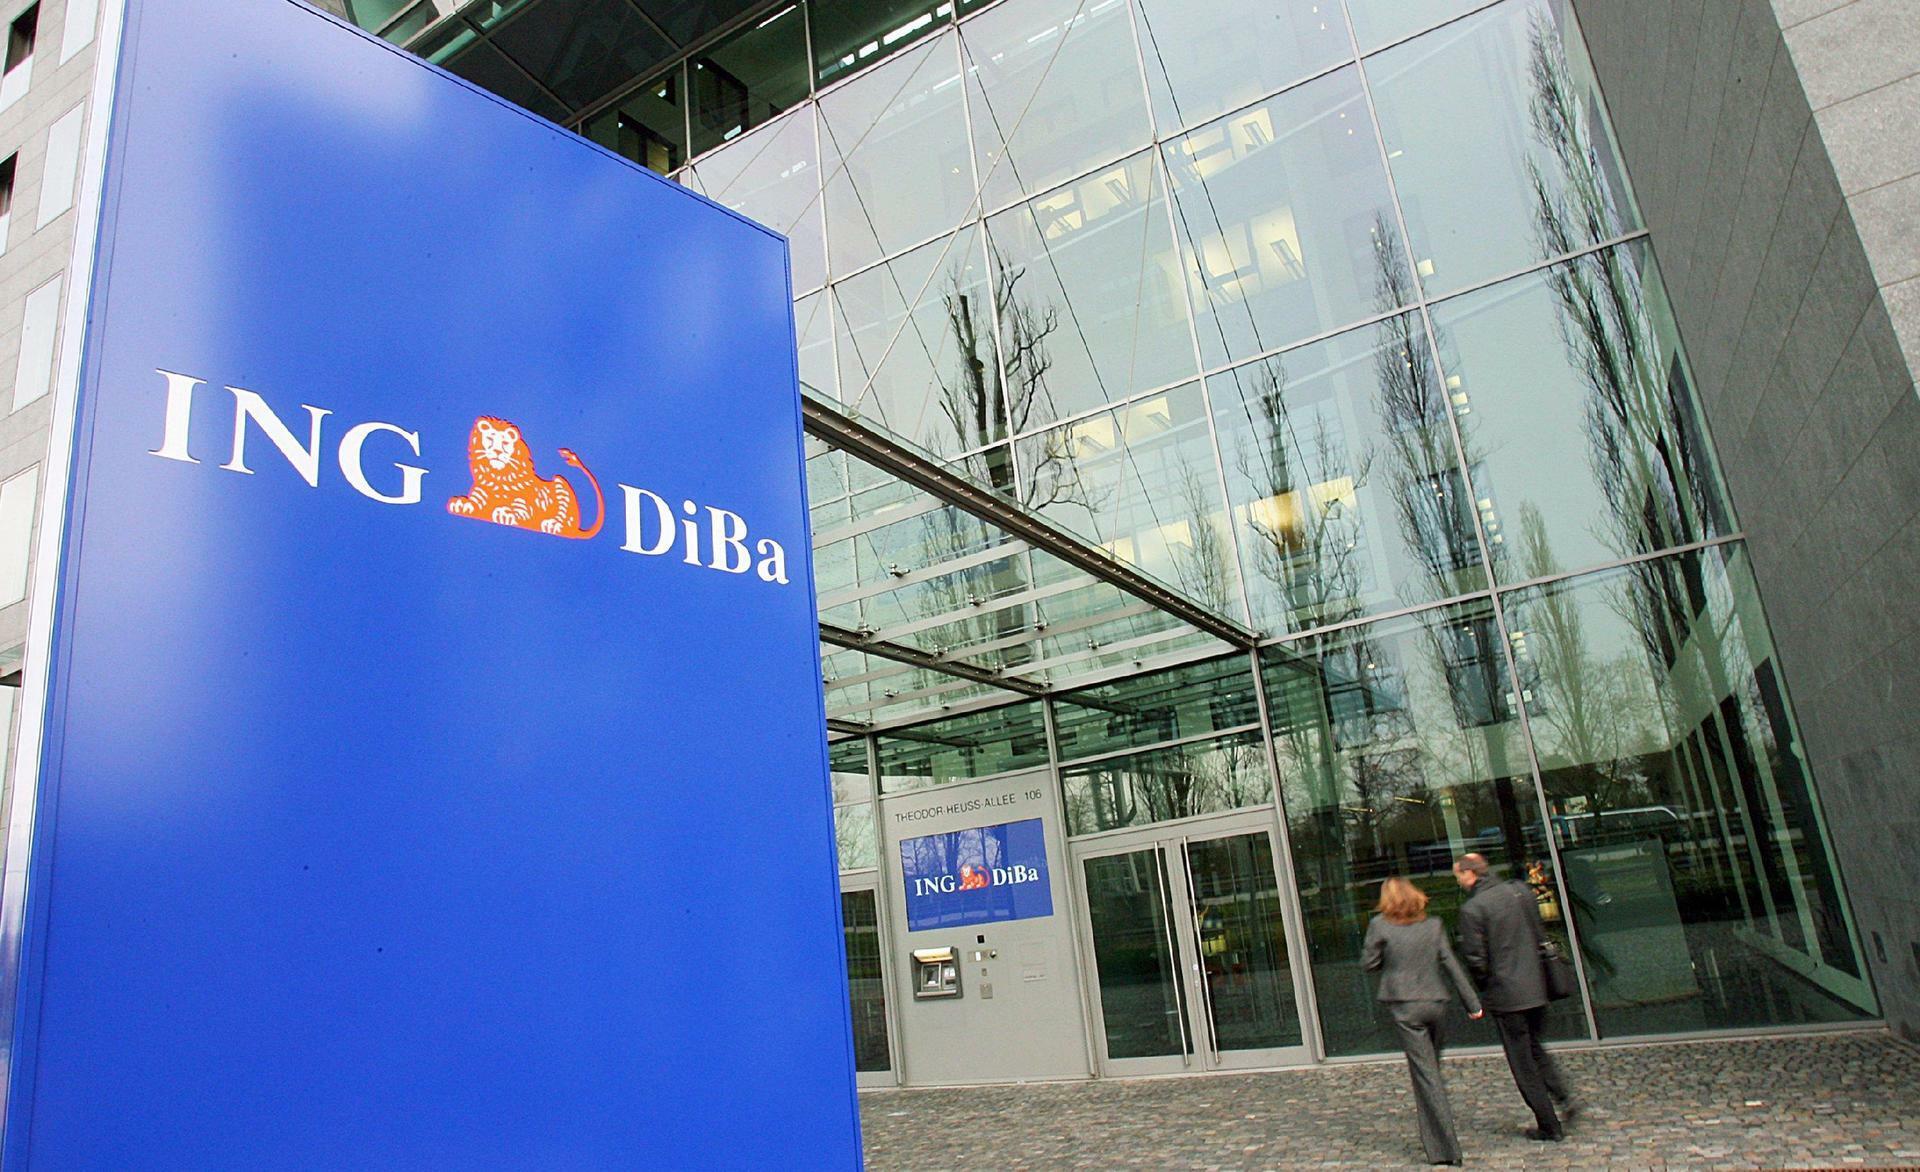 Wurst Kampagne ING Diba kapituliert vor Vegetariern